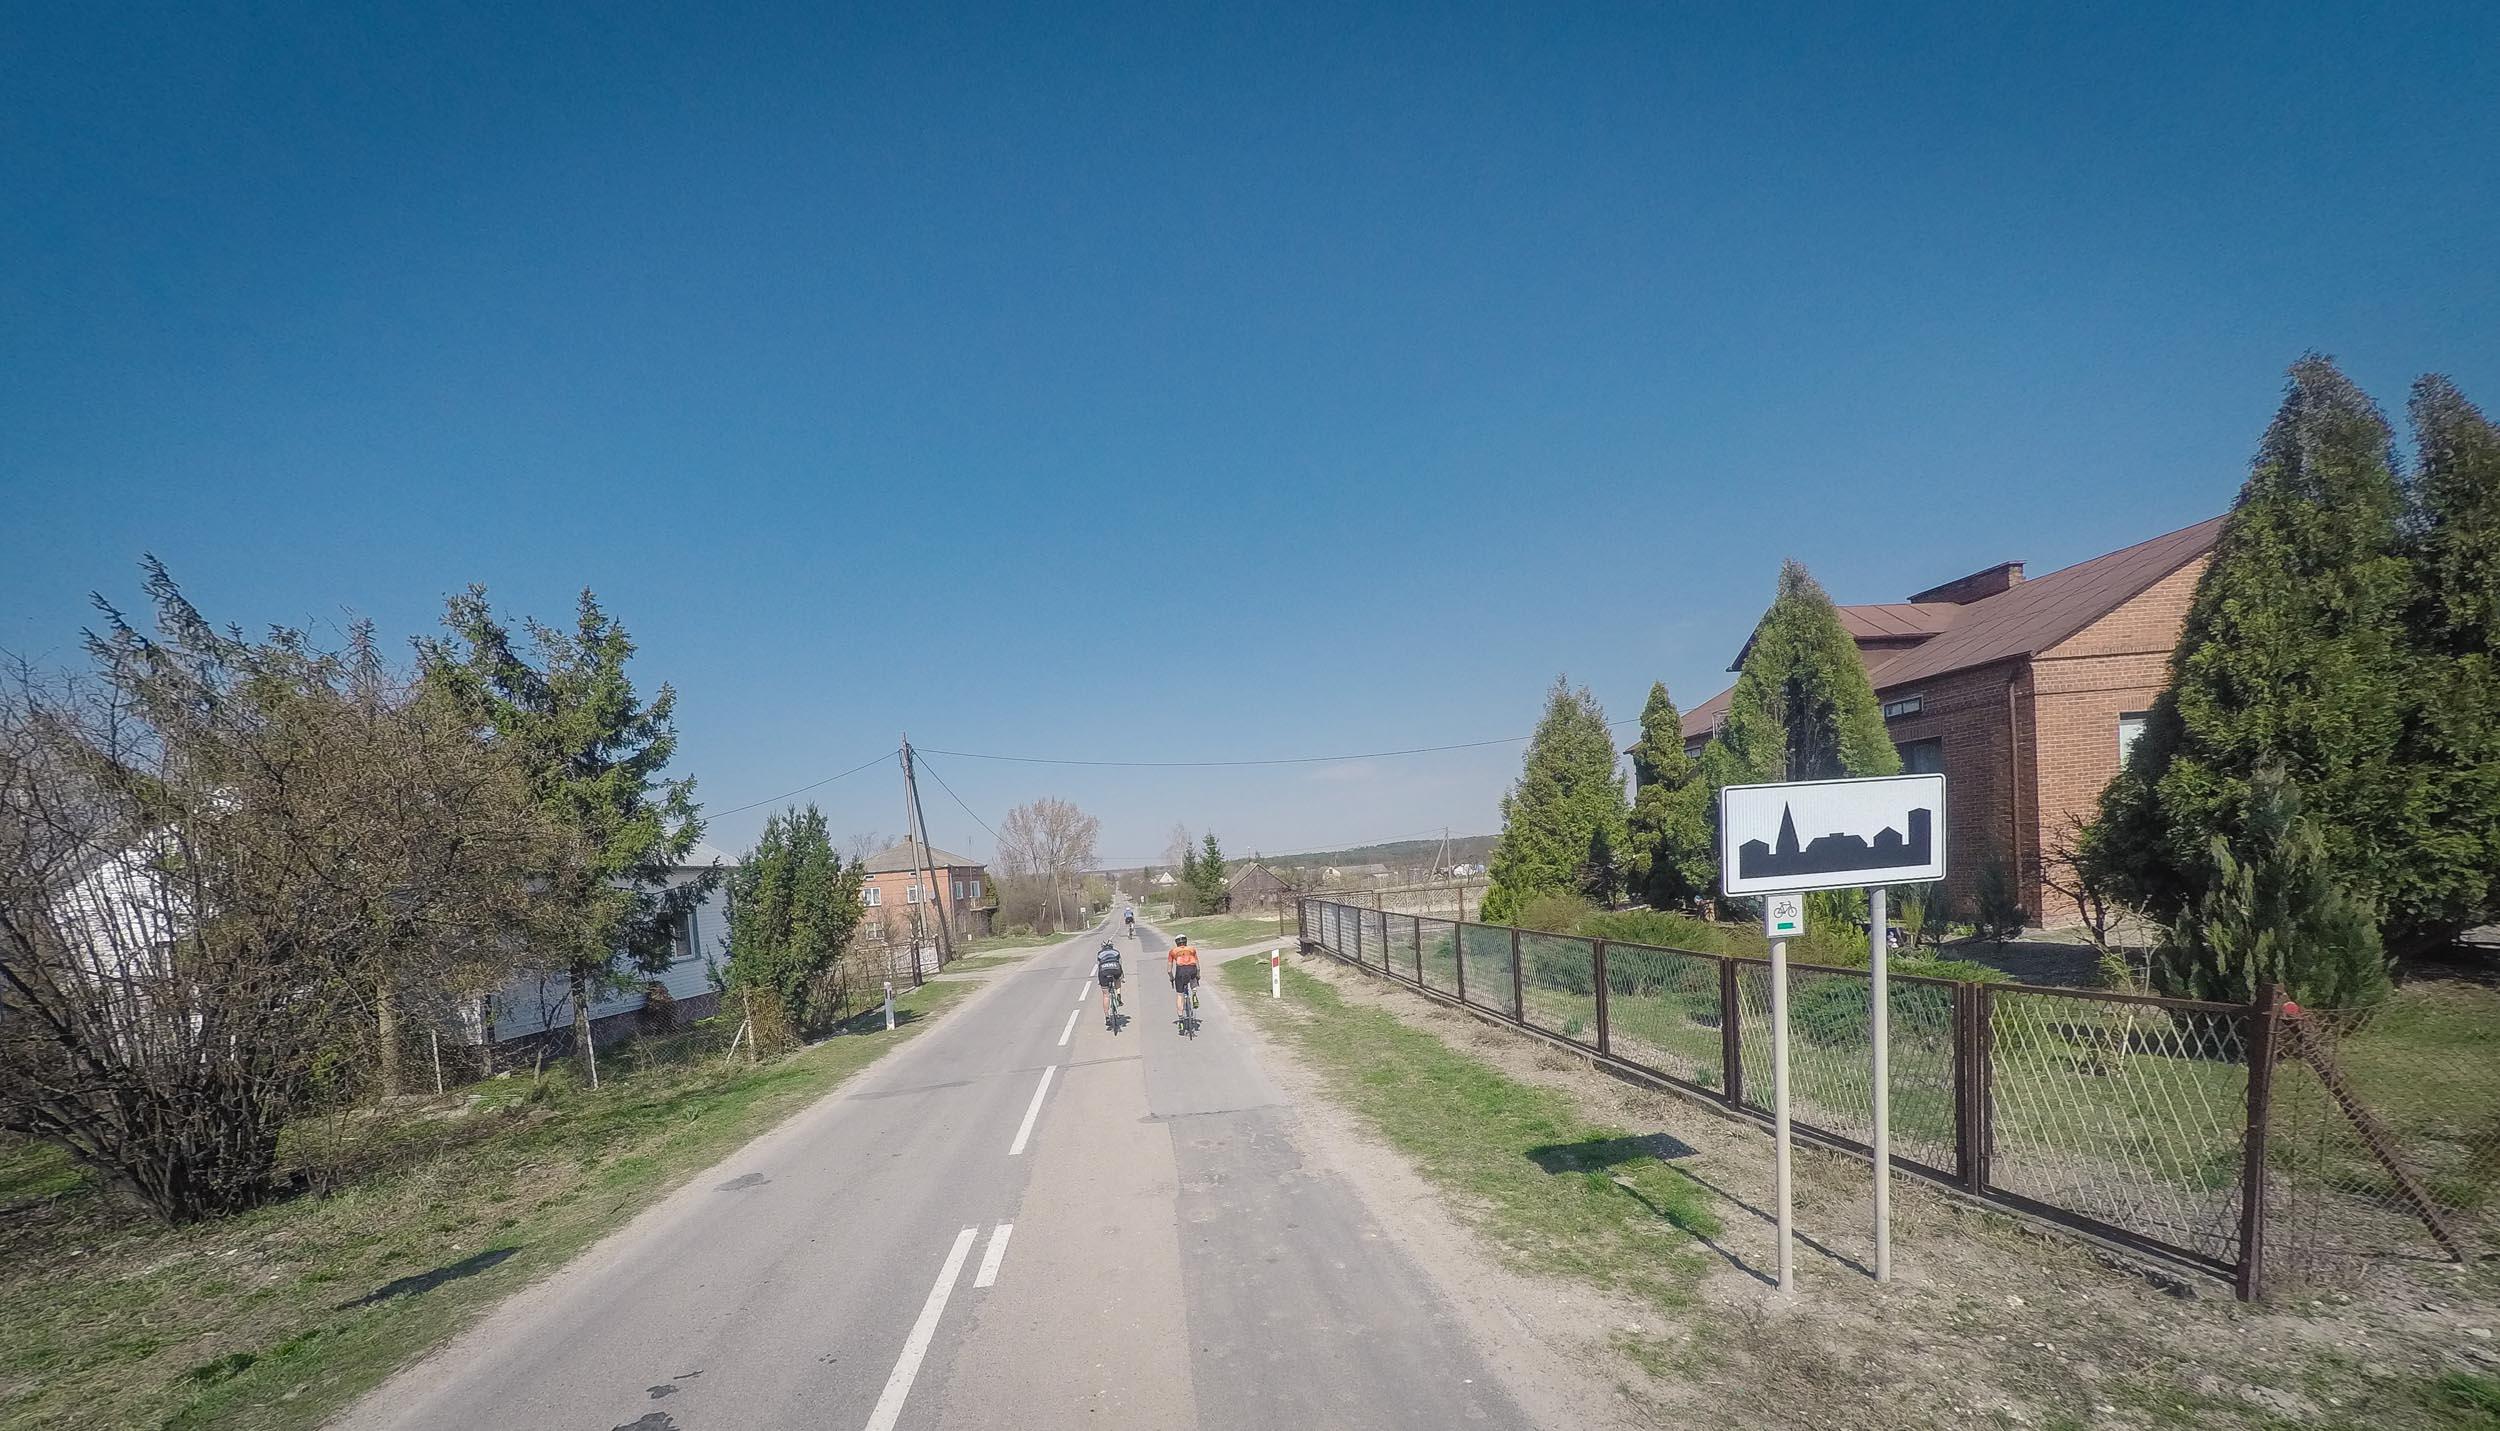 droga we wsi